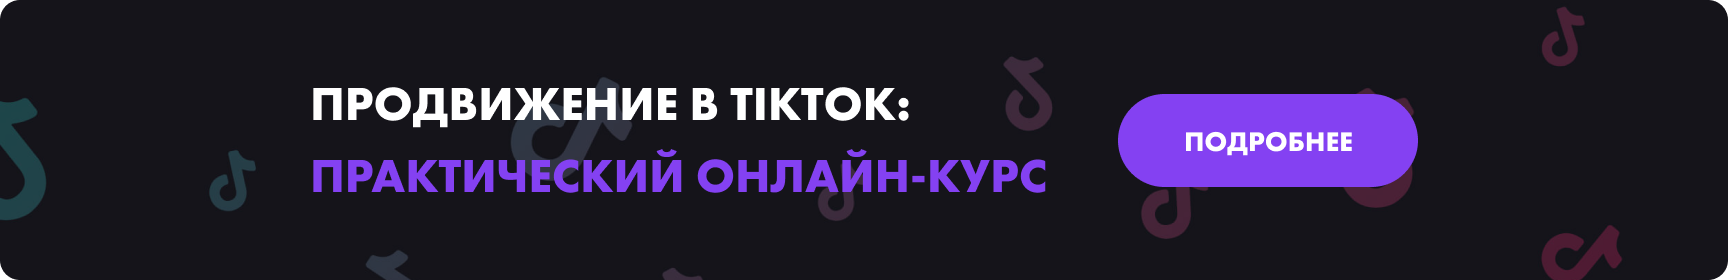 Ссылка на курс TikTok от Humee